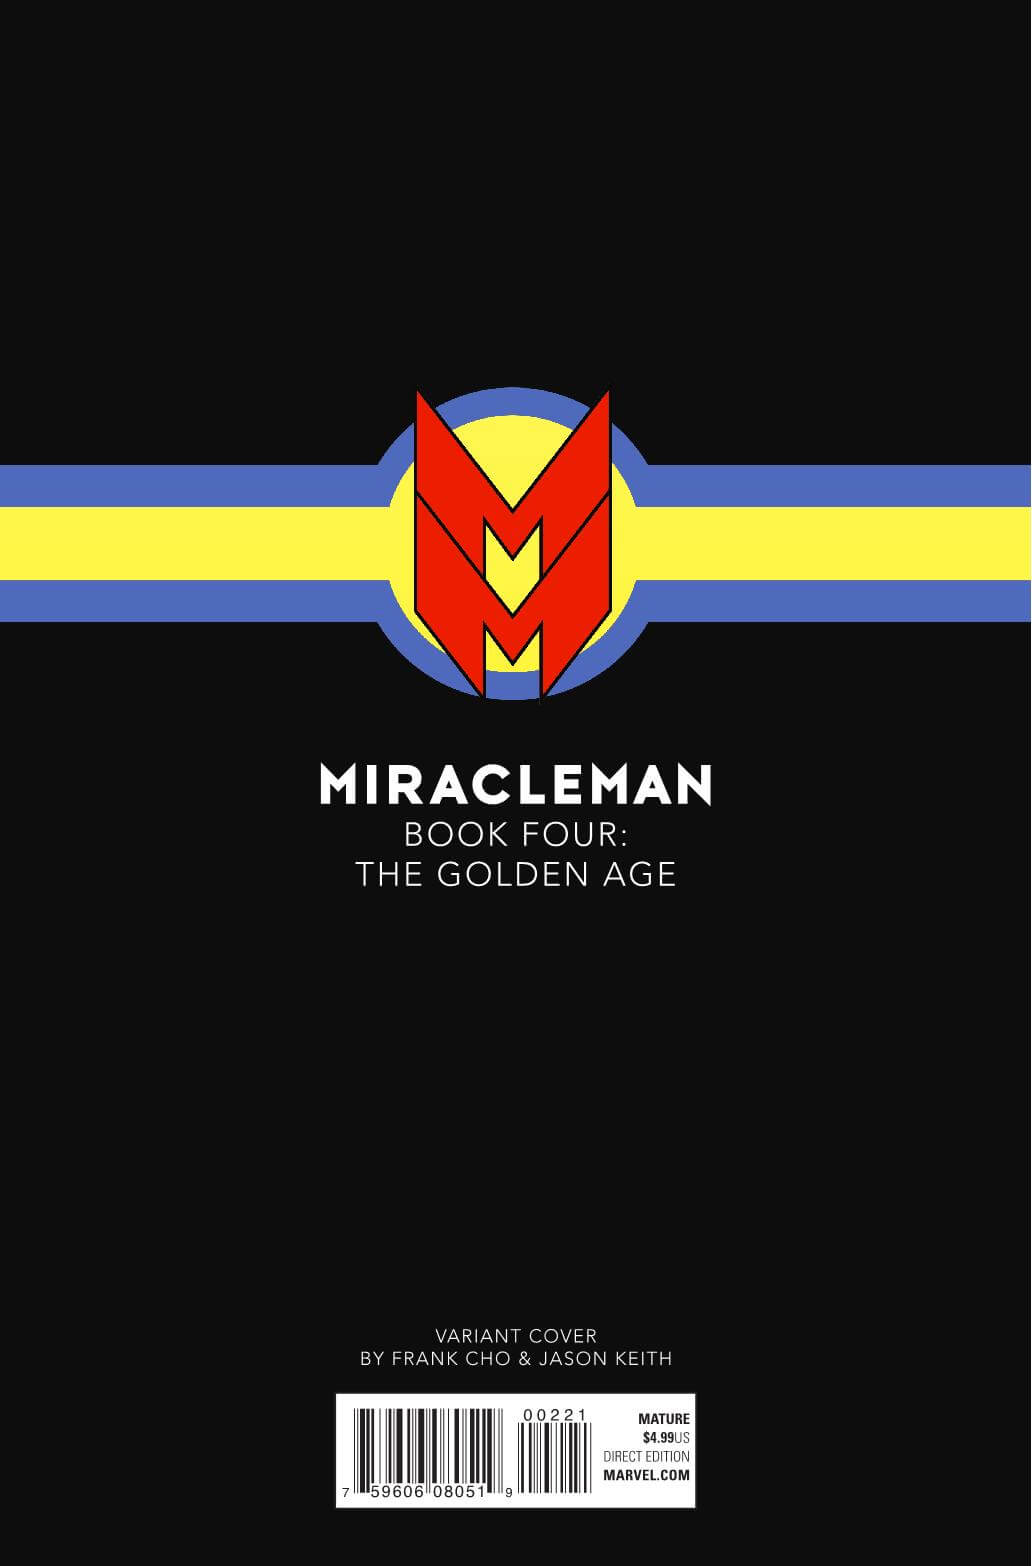 MIRACLEMANCOV2015002_DC21_2